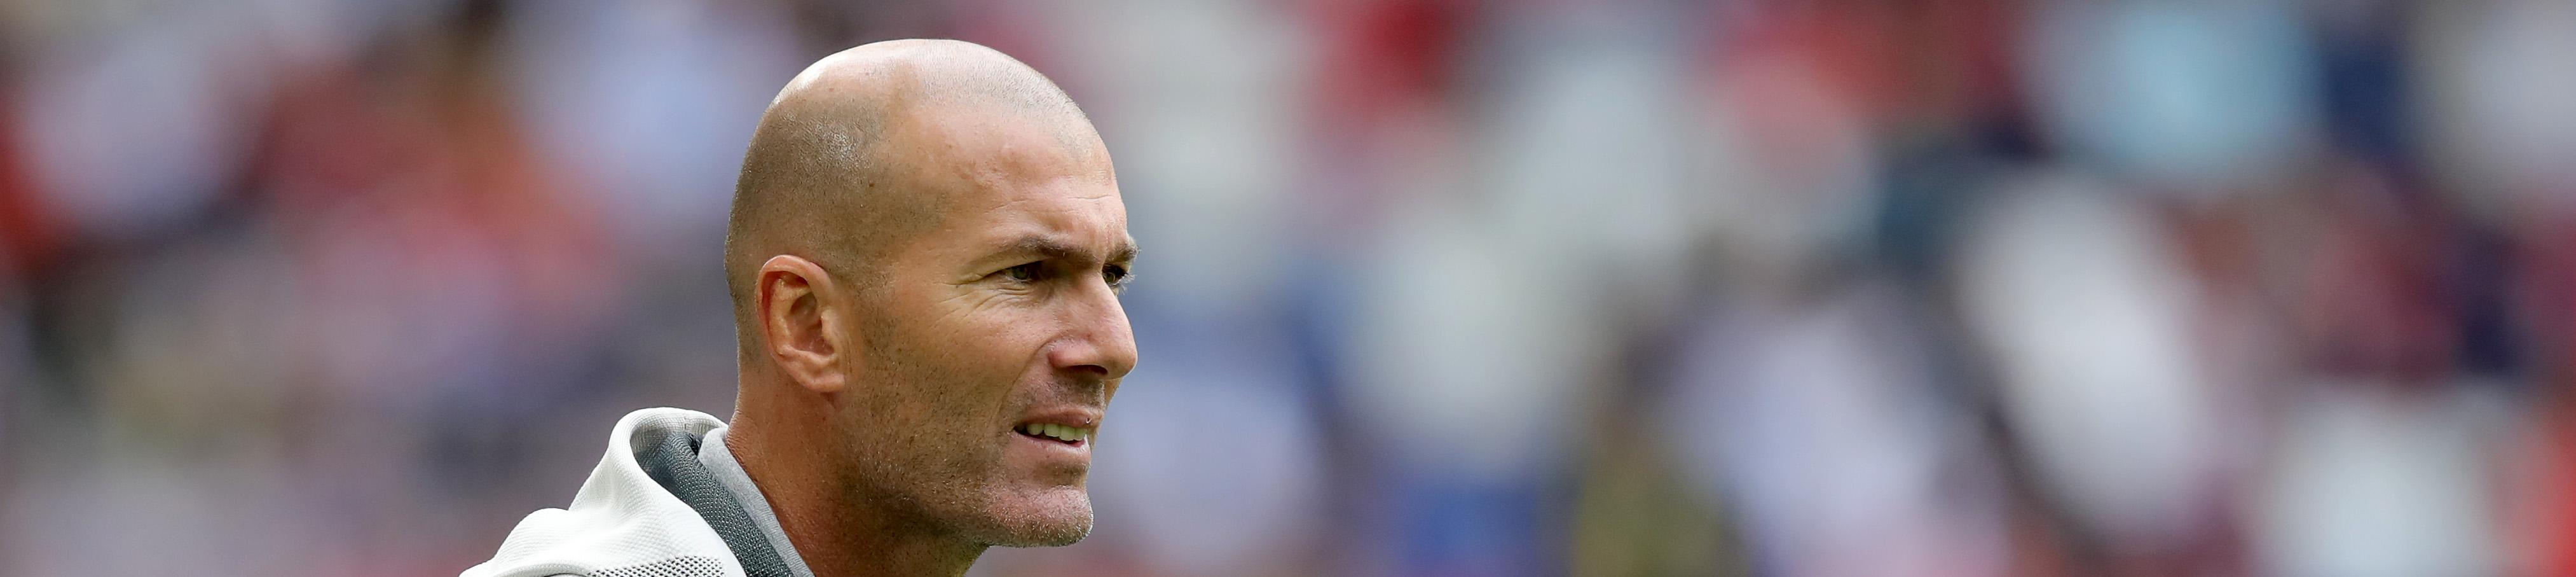 Maiorca-Real Madrid, Zidane ordina alle merengues il salto di qualità